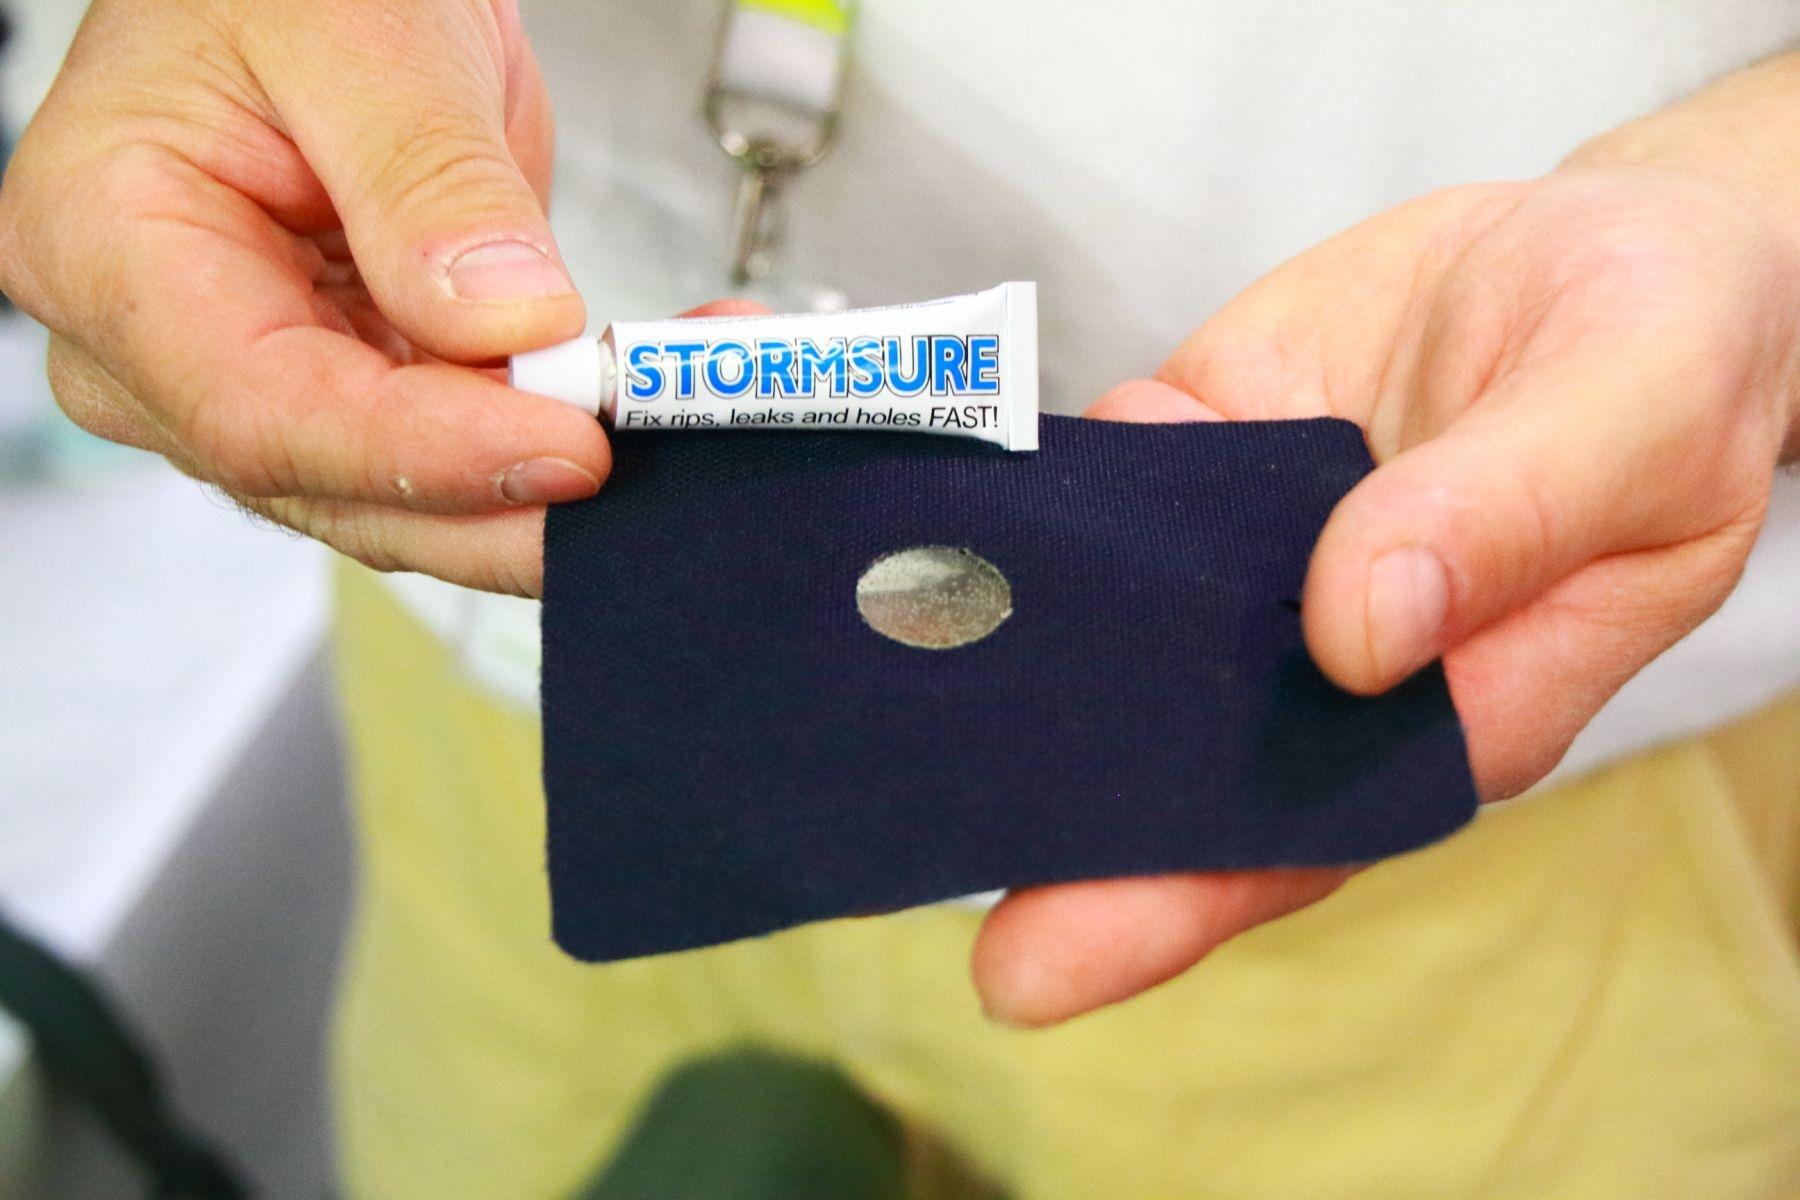 Stormsure 1